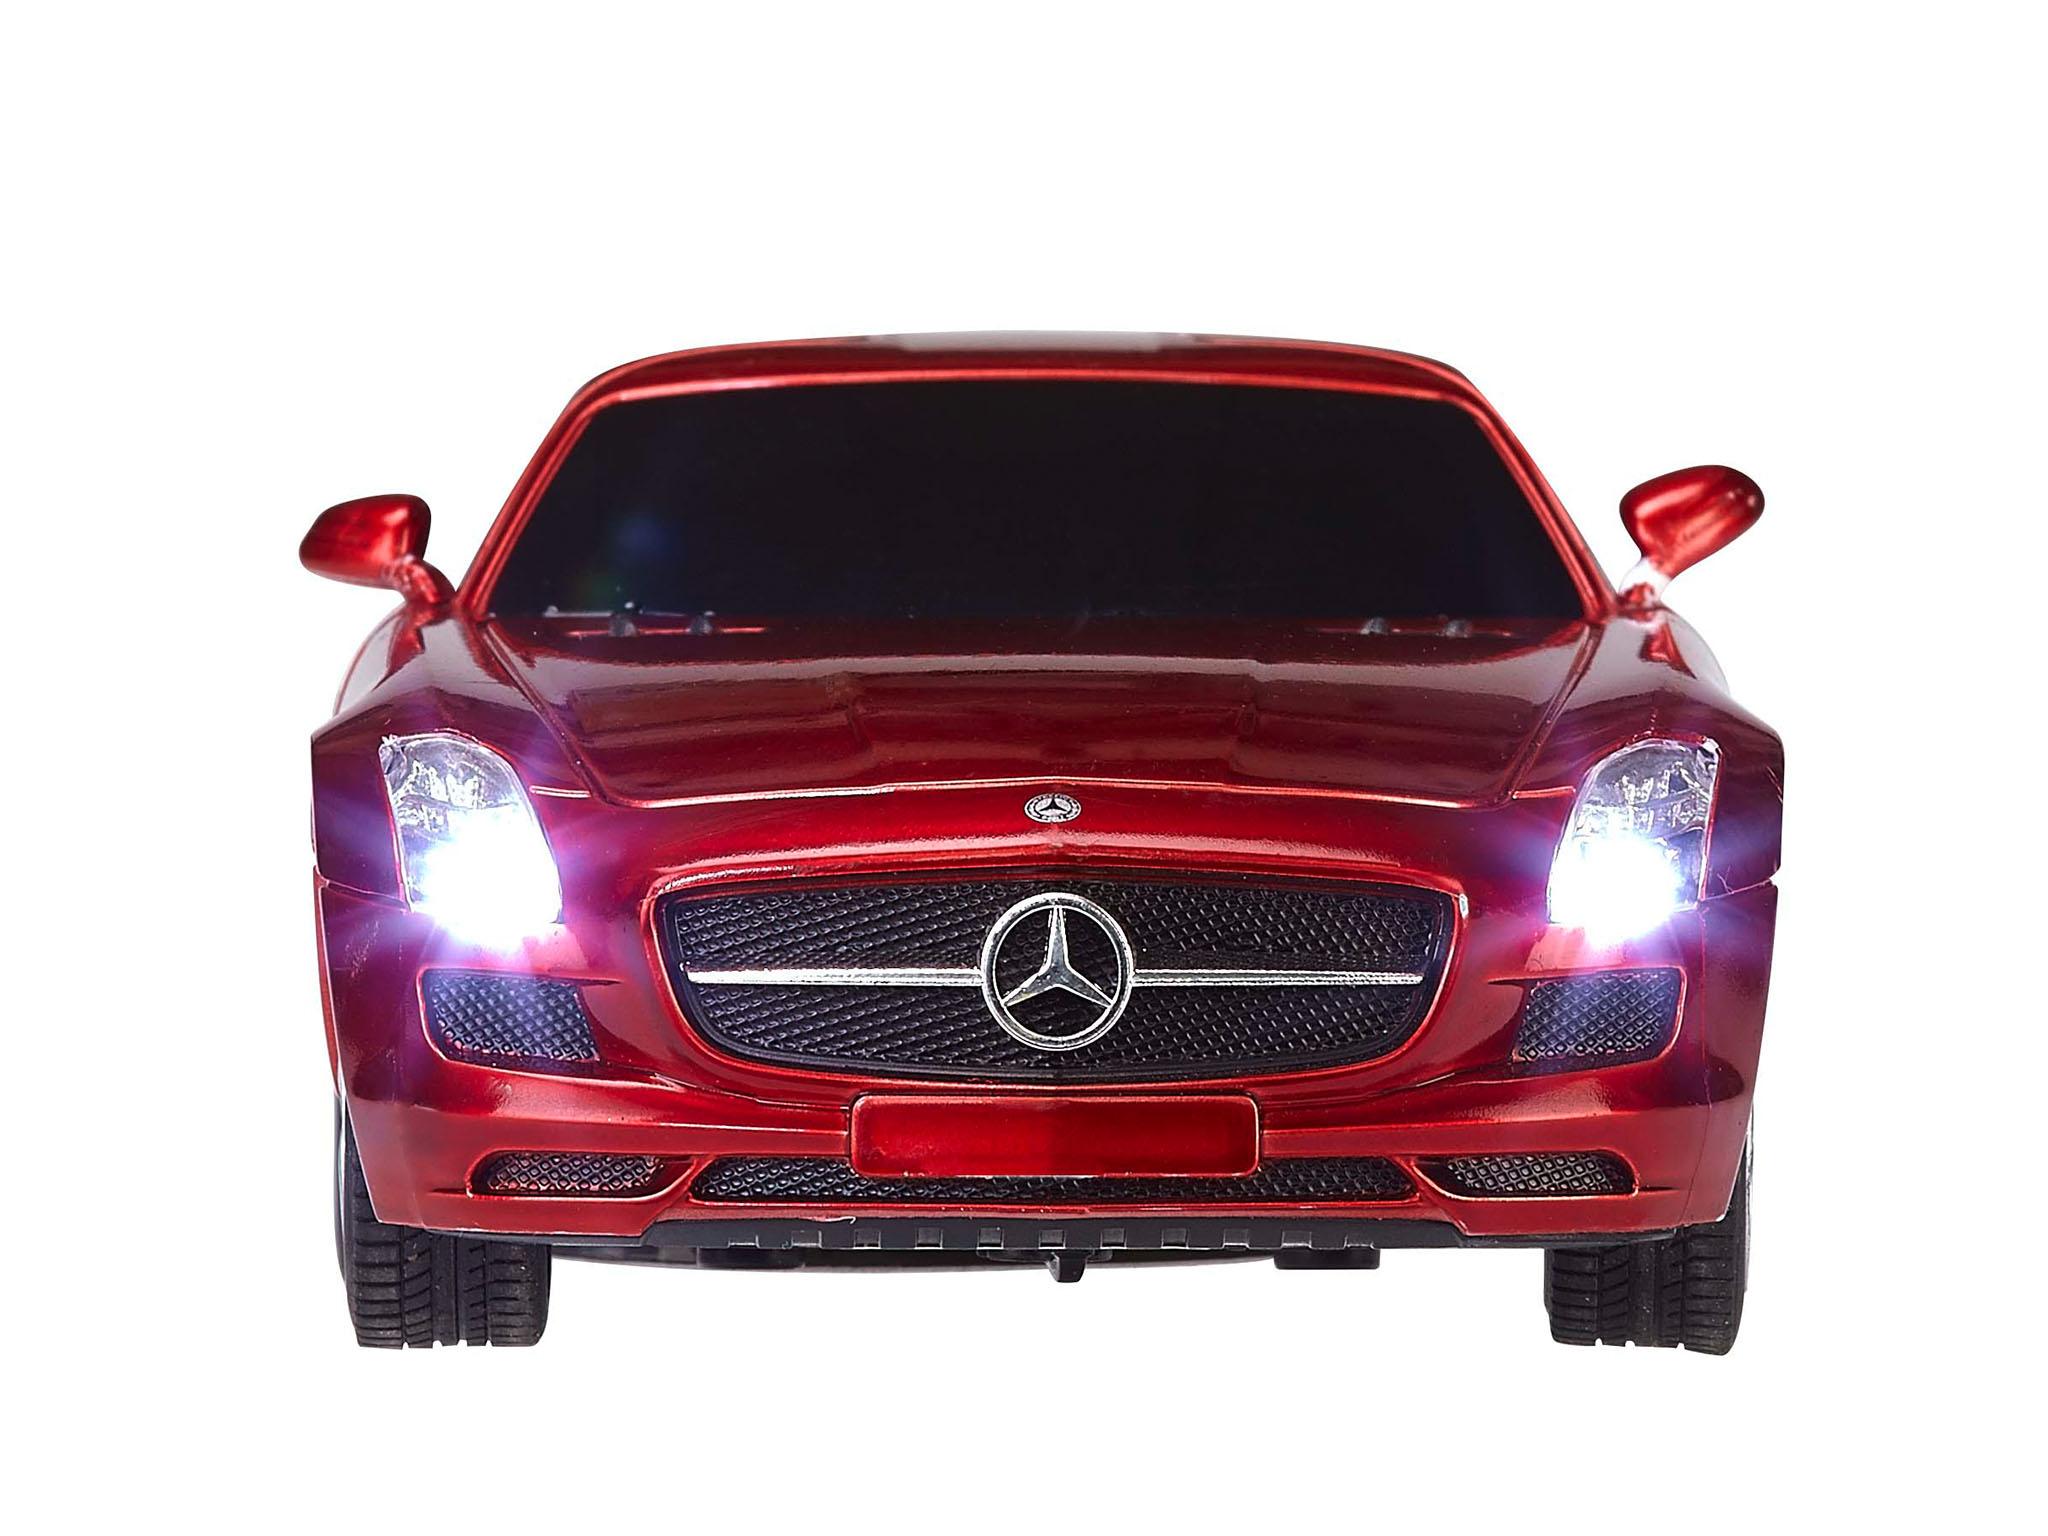 revell control 24651 mercedes sls amg rc sportwagen. Black Bedroom Furniture Sets. Home Design Ideas